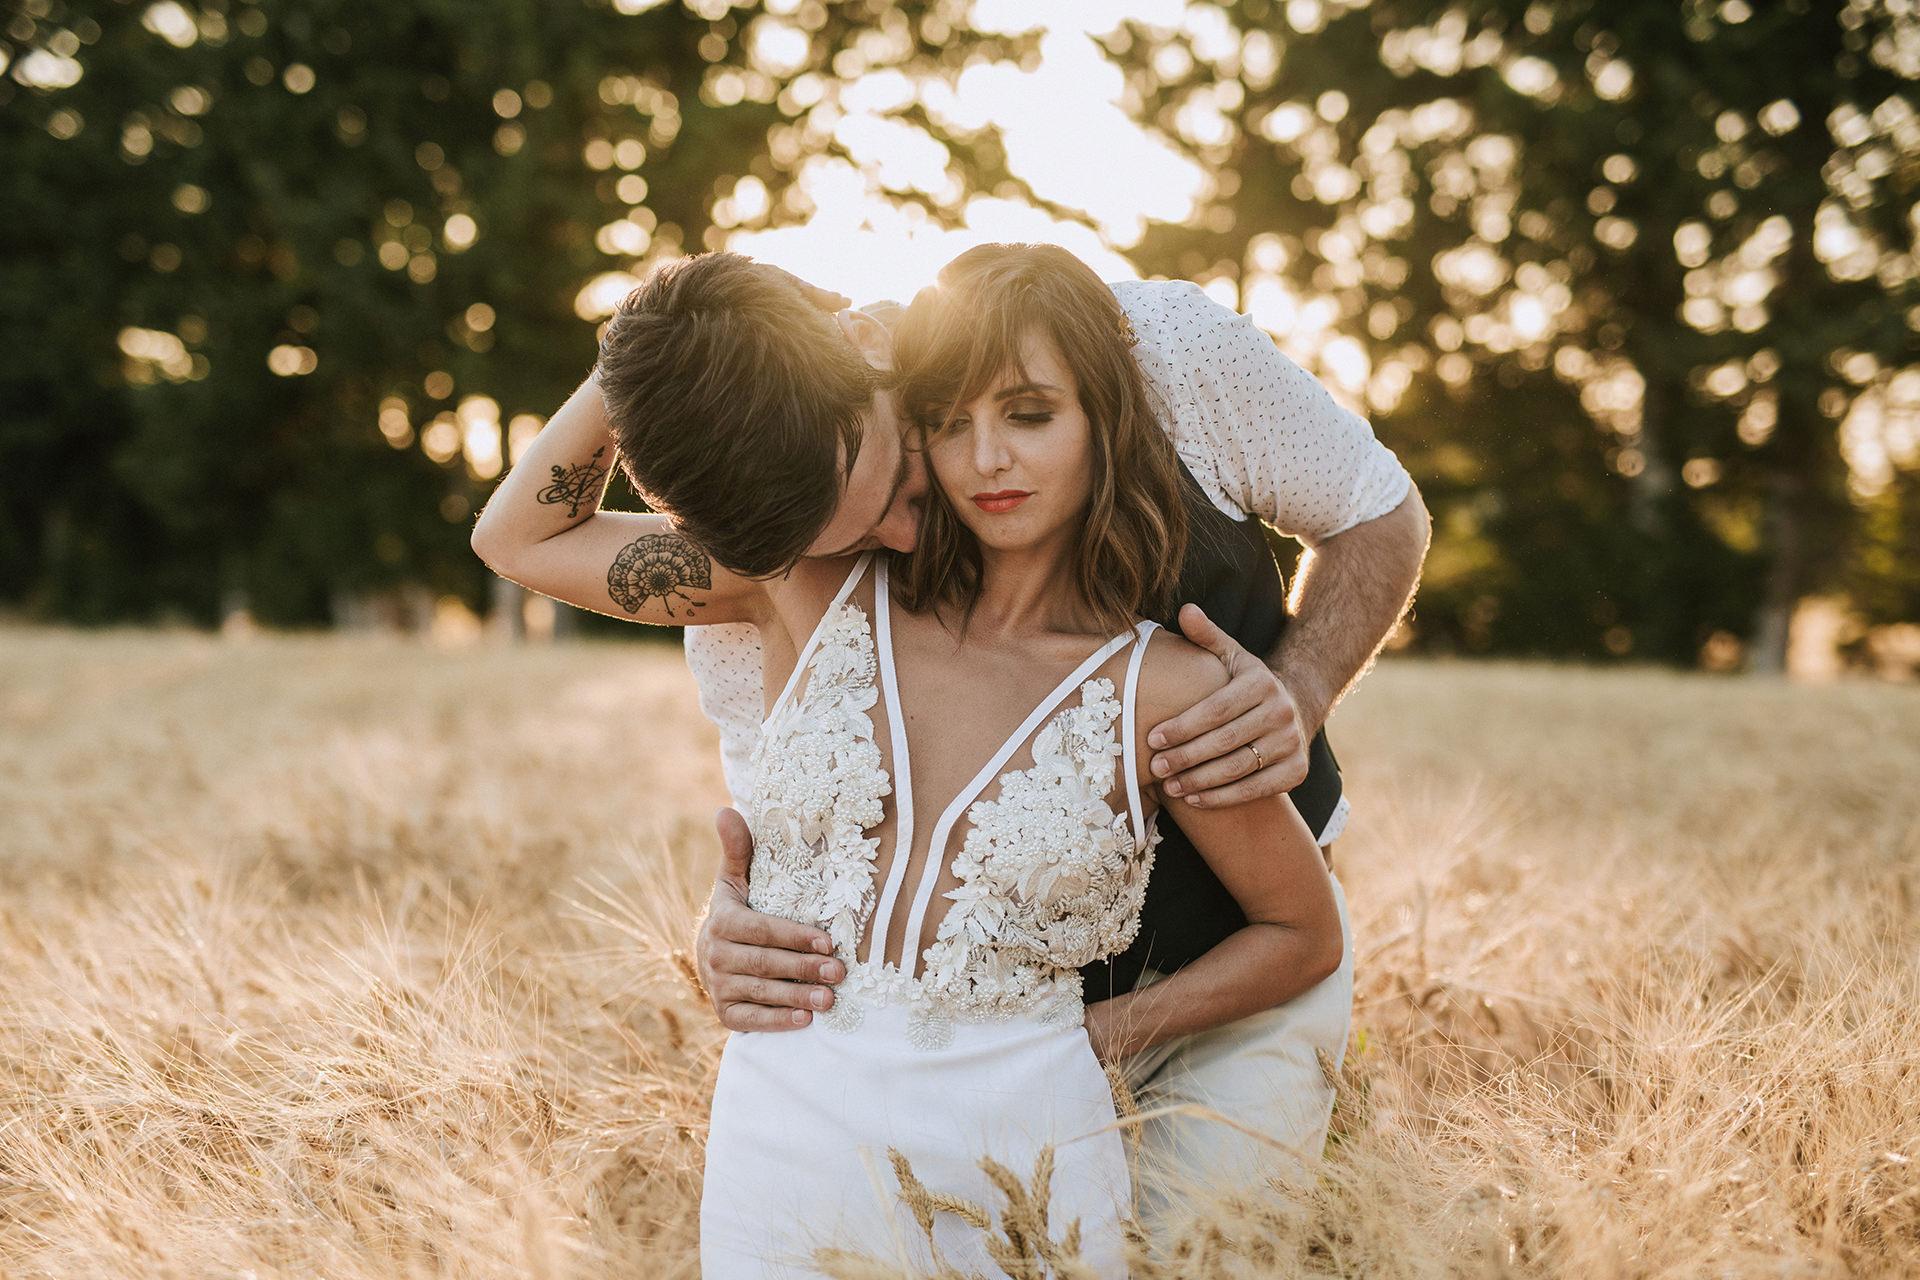 Wedding_Marine+Guillaume_petit_roulet_provence_neupapphotography-616.jpg